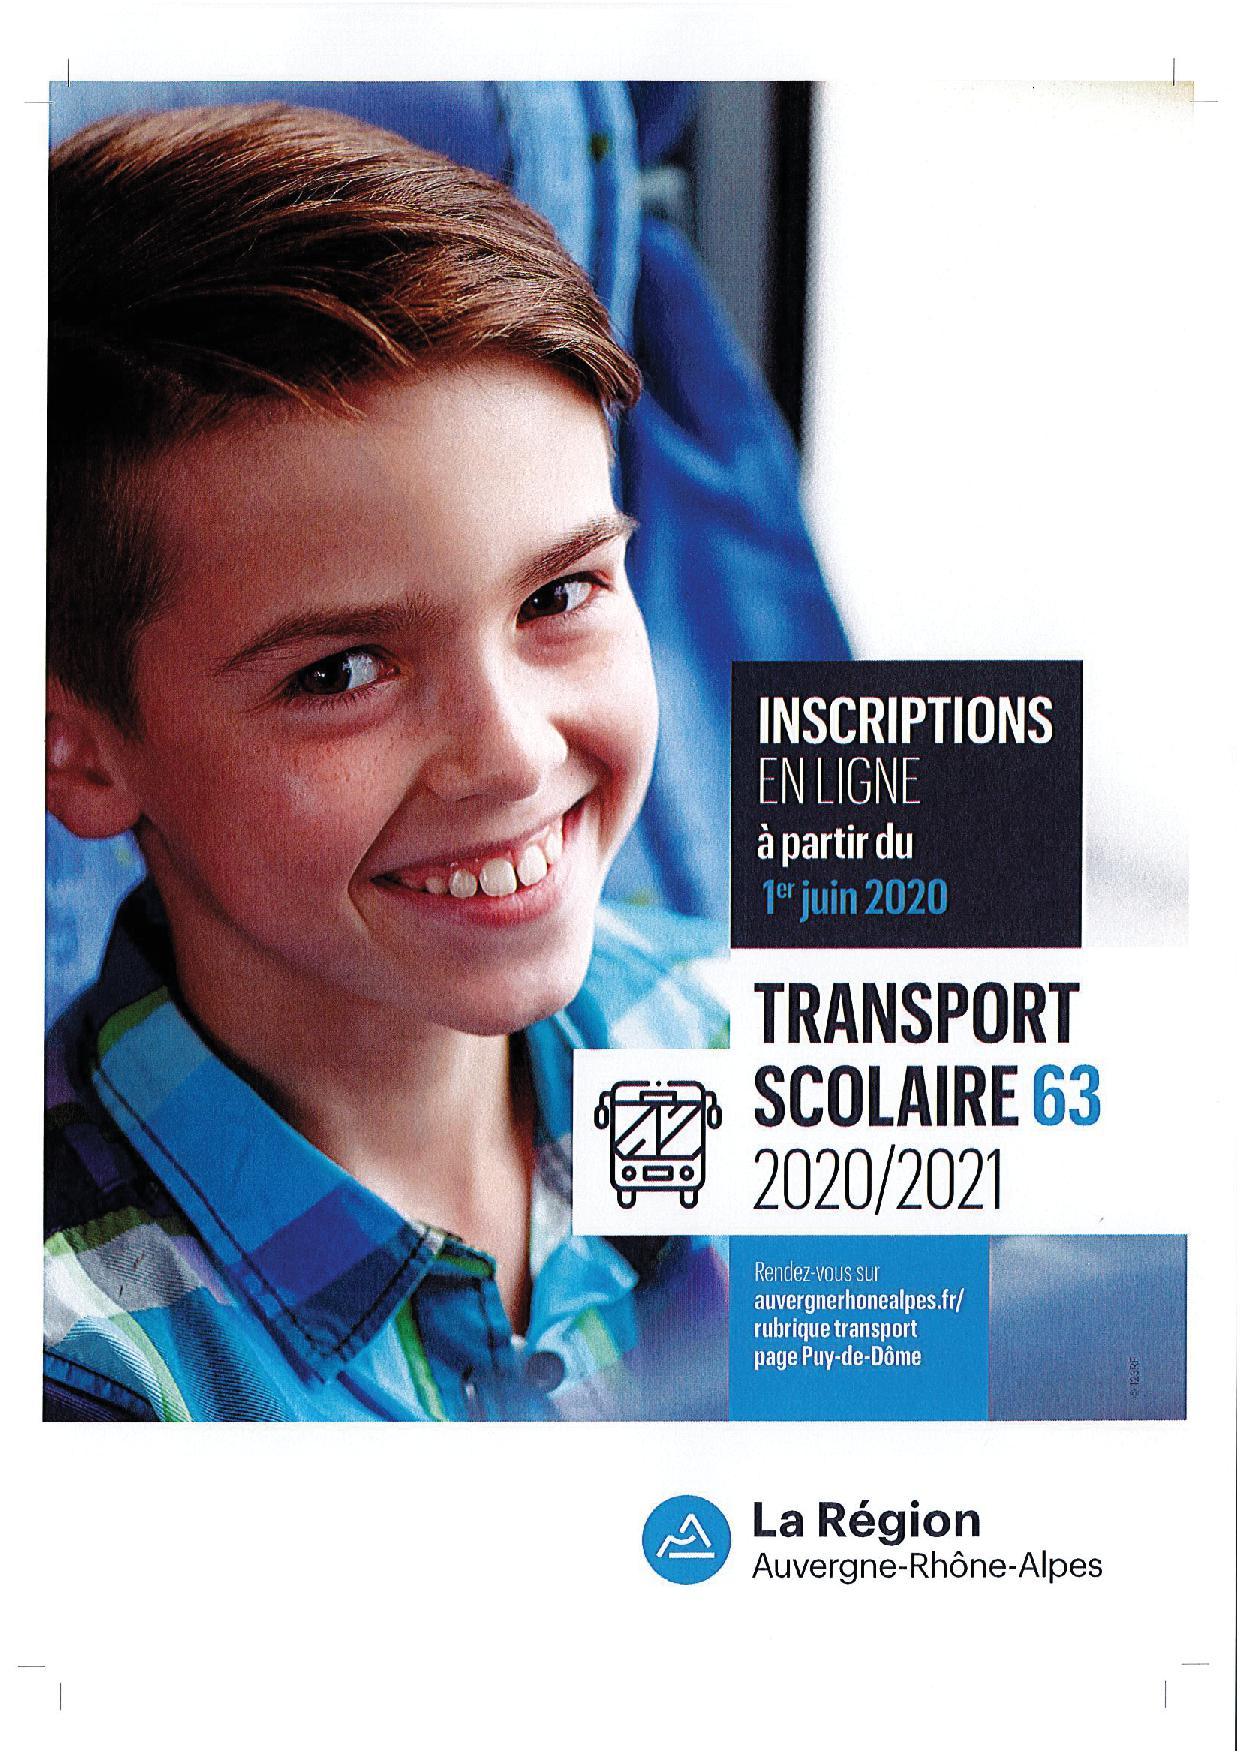 affiche transports 2020 _1_.jpg